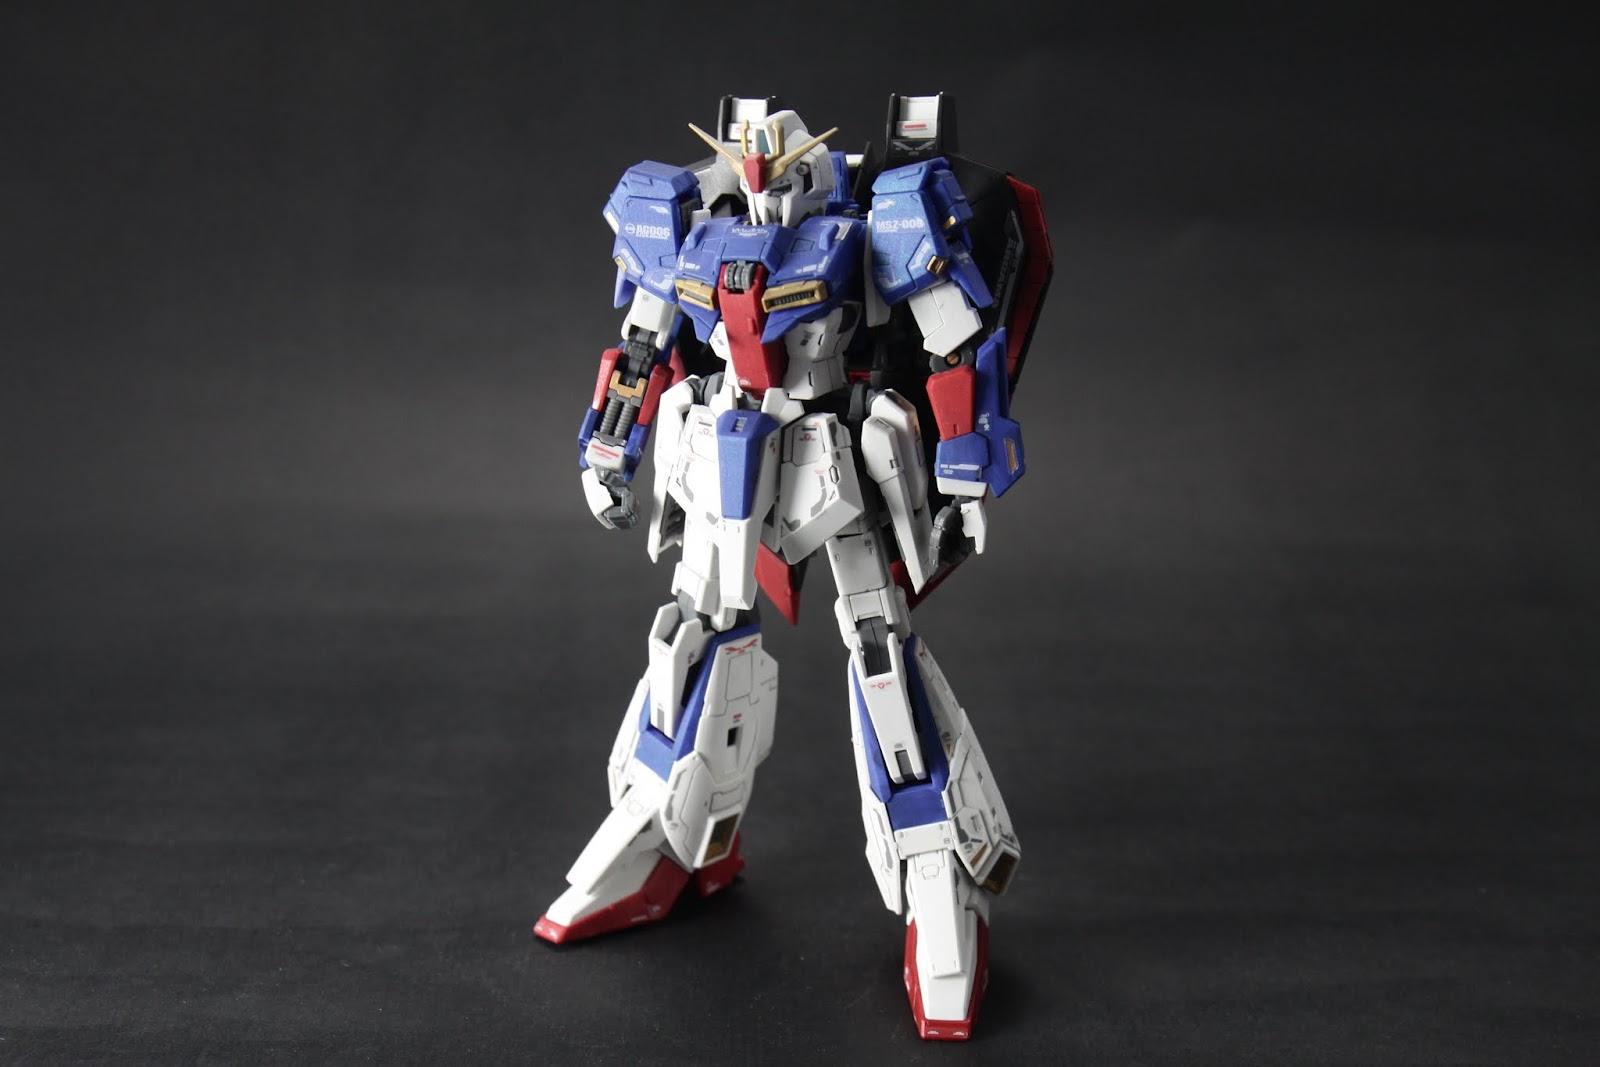 Zeta Gundam本體 其實我有全機上色